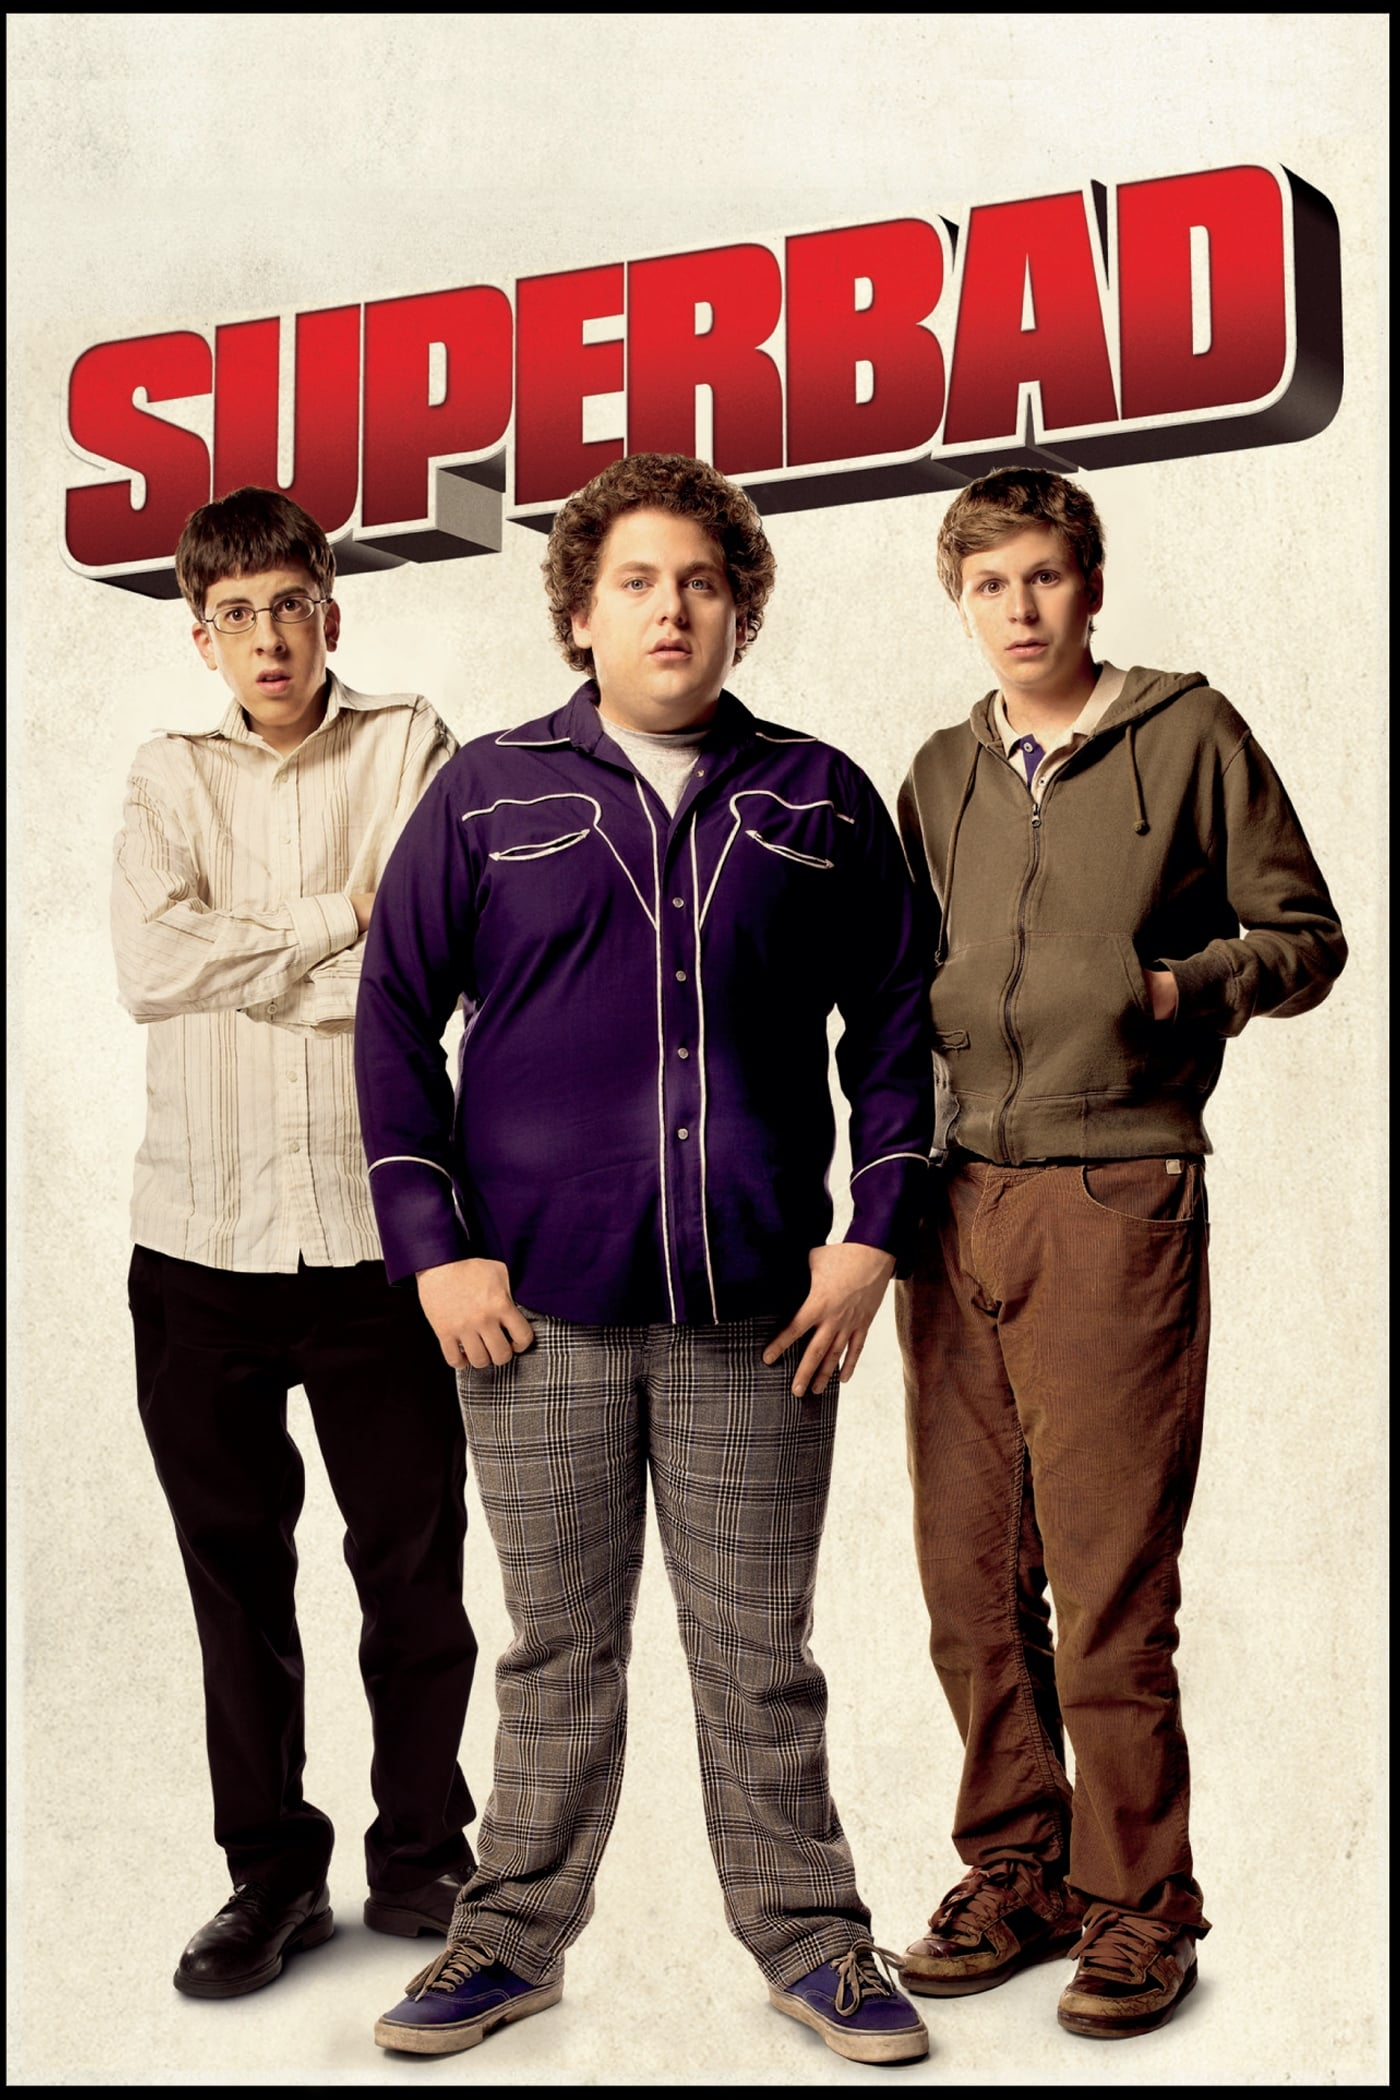 Superbad 2007  Posters  The Movie Database TMDb